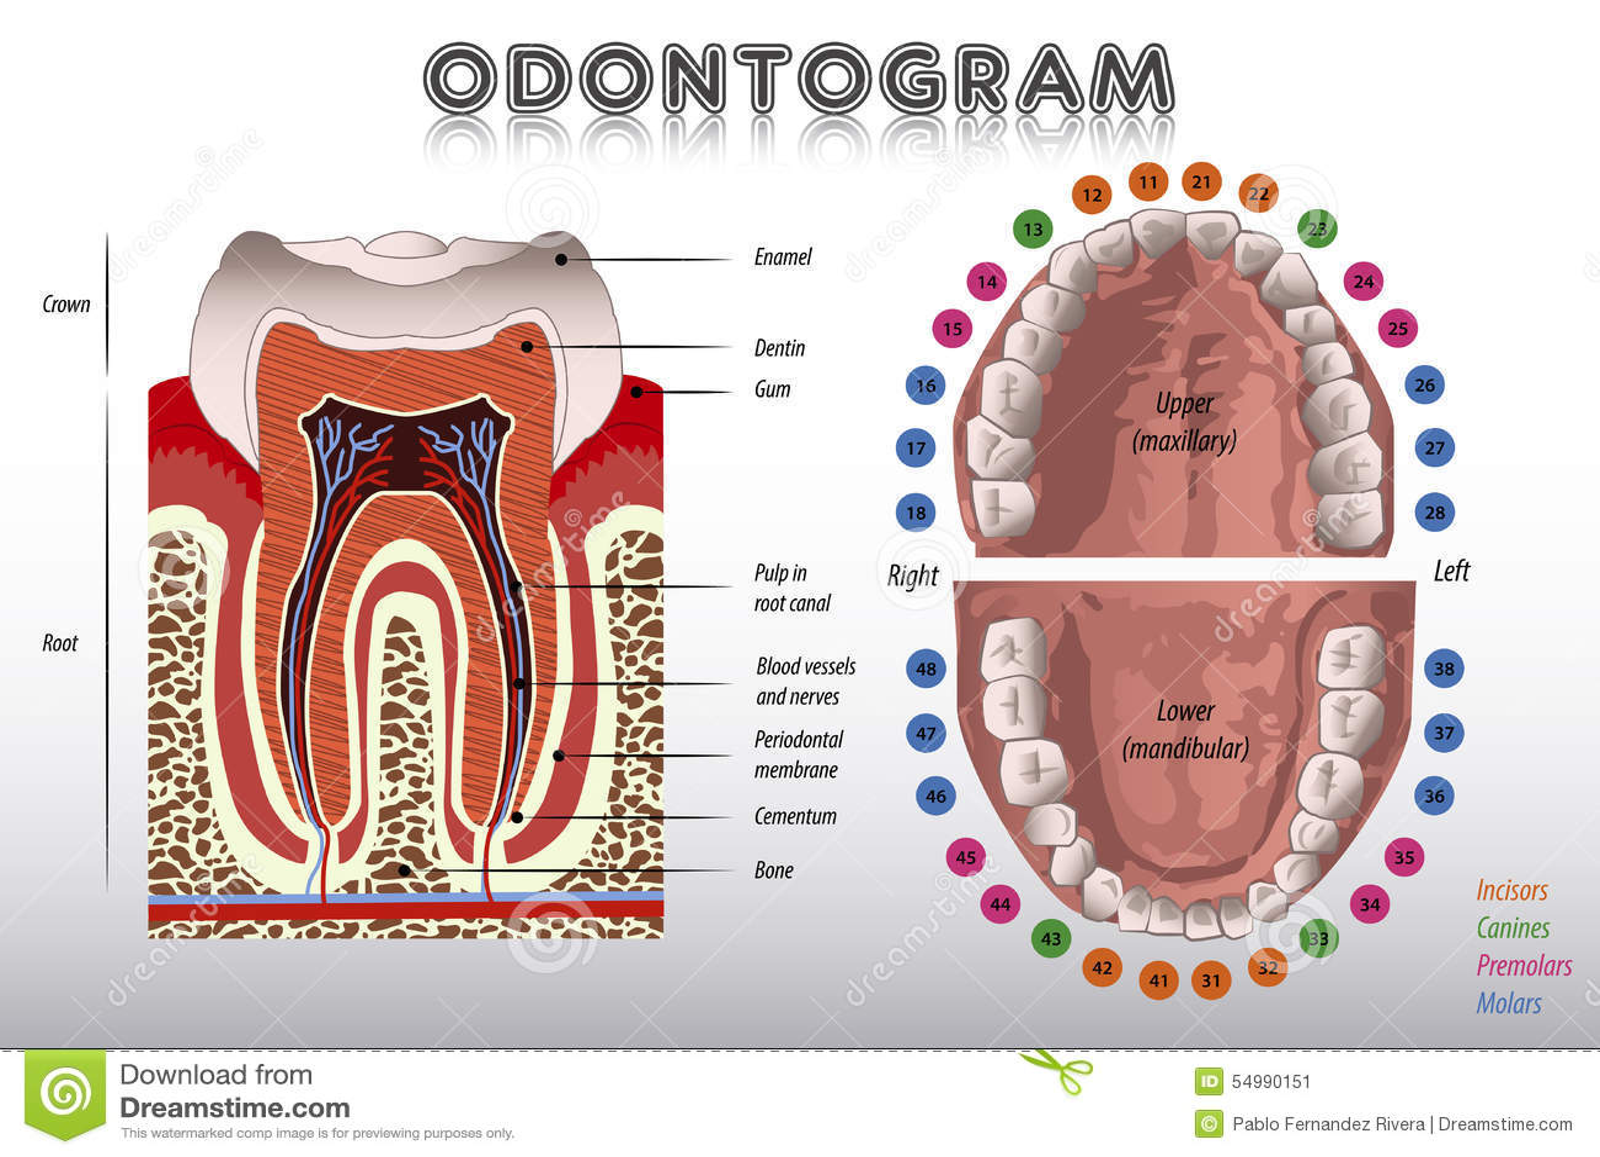 Odontogram Tanddiagram